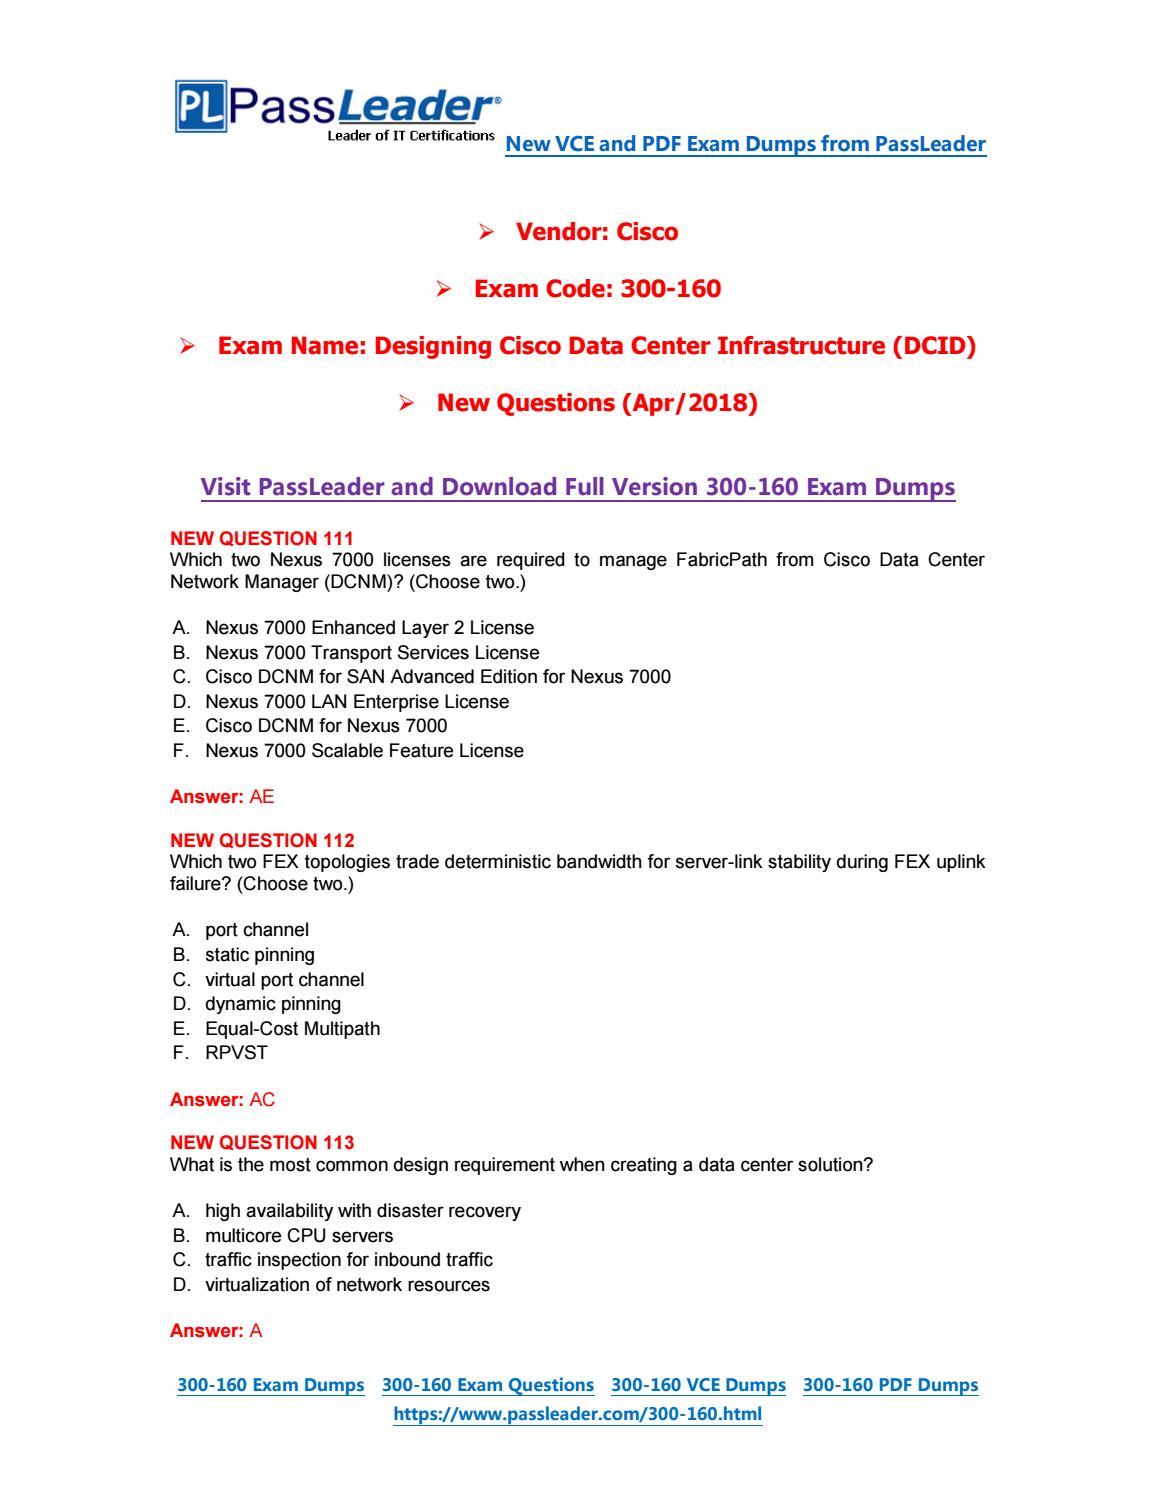 2019-New-PassLeader-300-160-Exam-Dumps-VCE-PDF-Braindumps-Exam